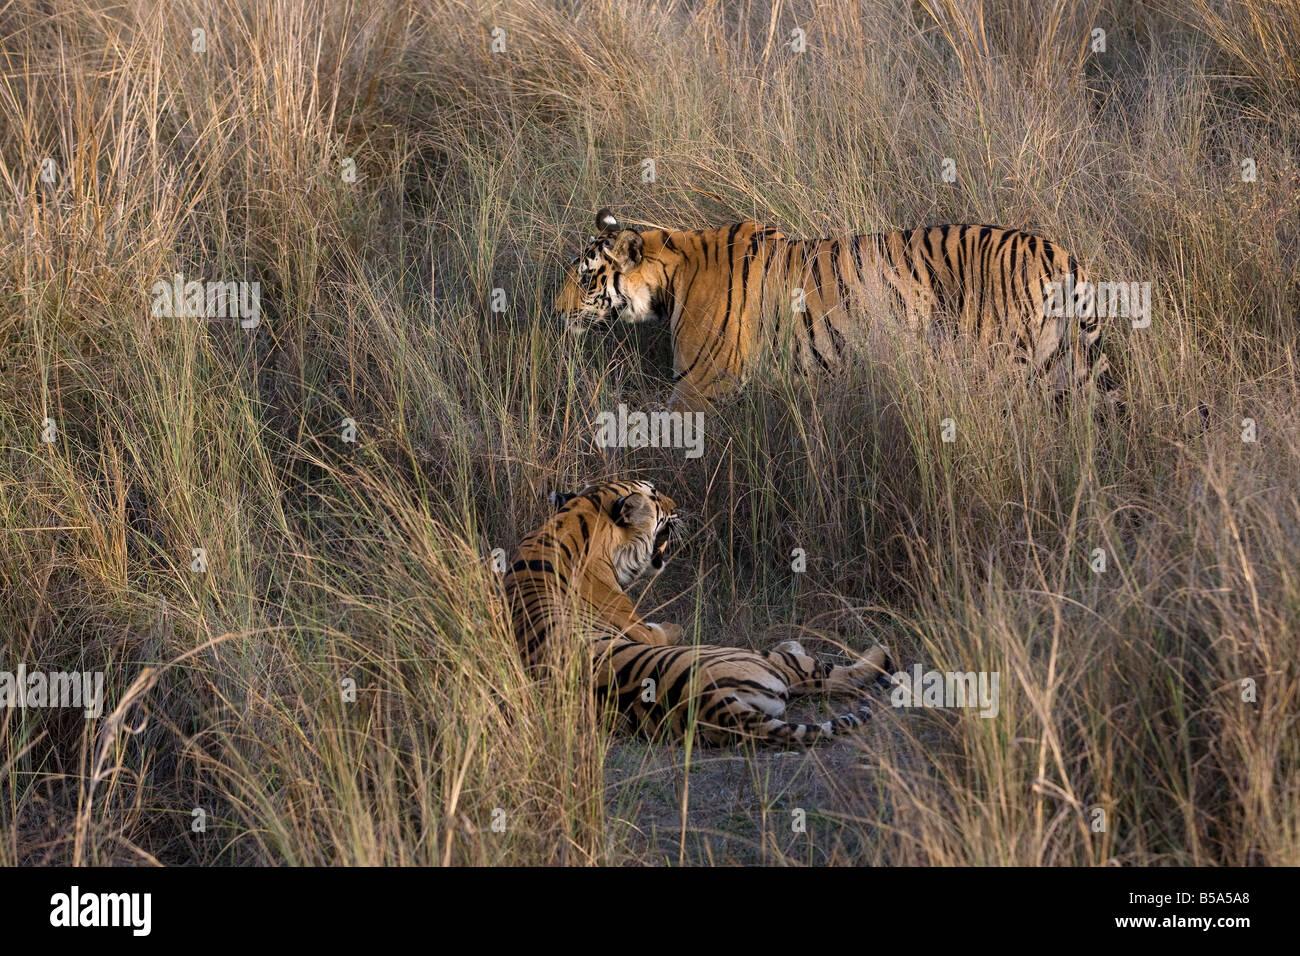 Tigre indio (tigre de bengala) (Panthera tigris tigris) bostezos, Parque Nacional Bandhavgarh, estado de Madhya Imagen De Stock